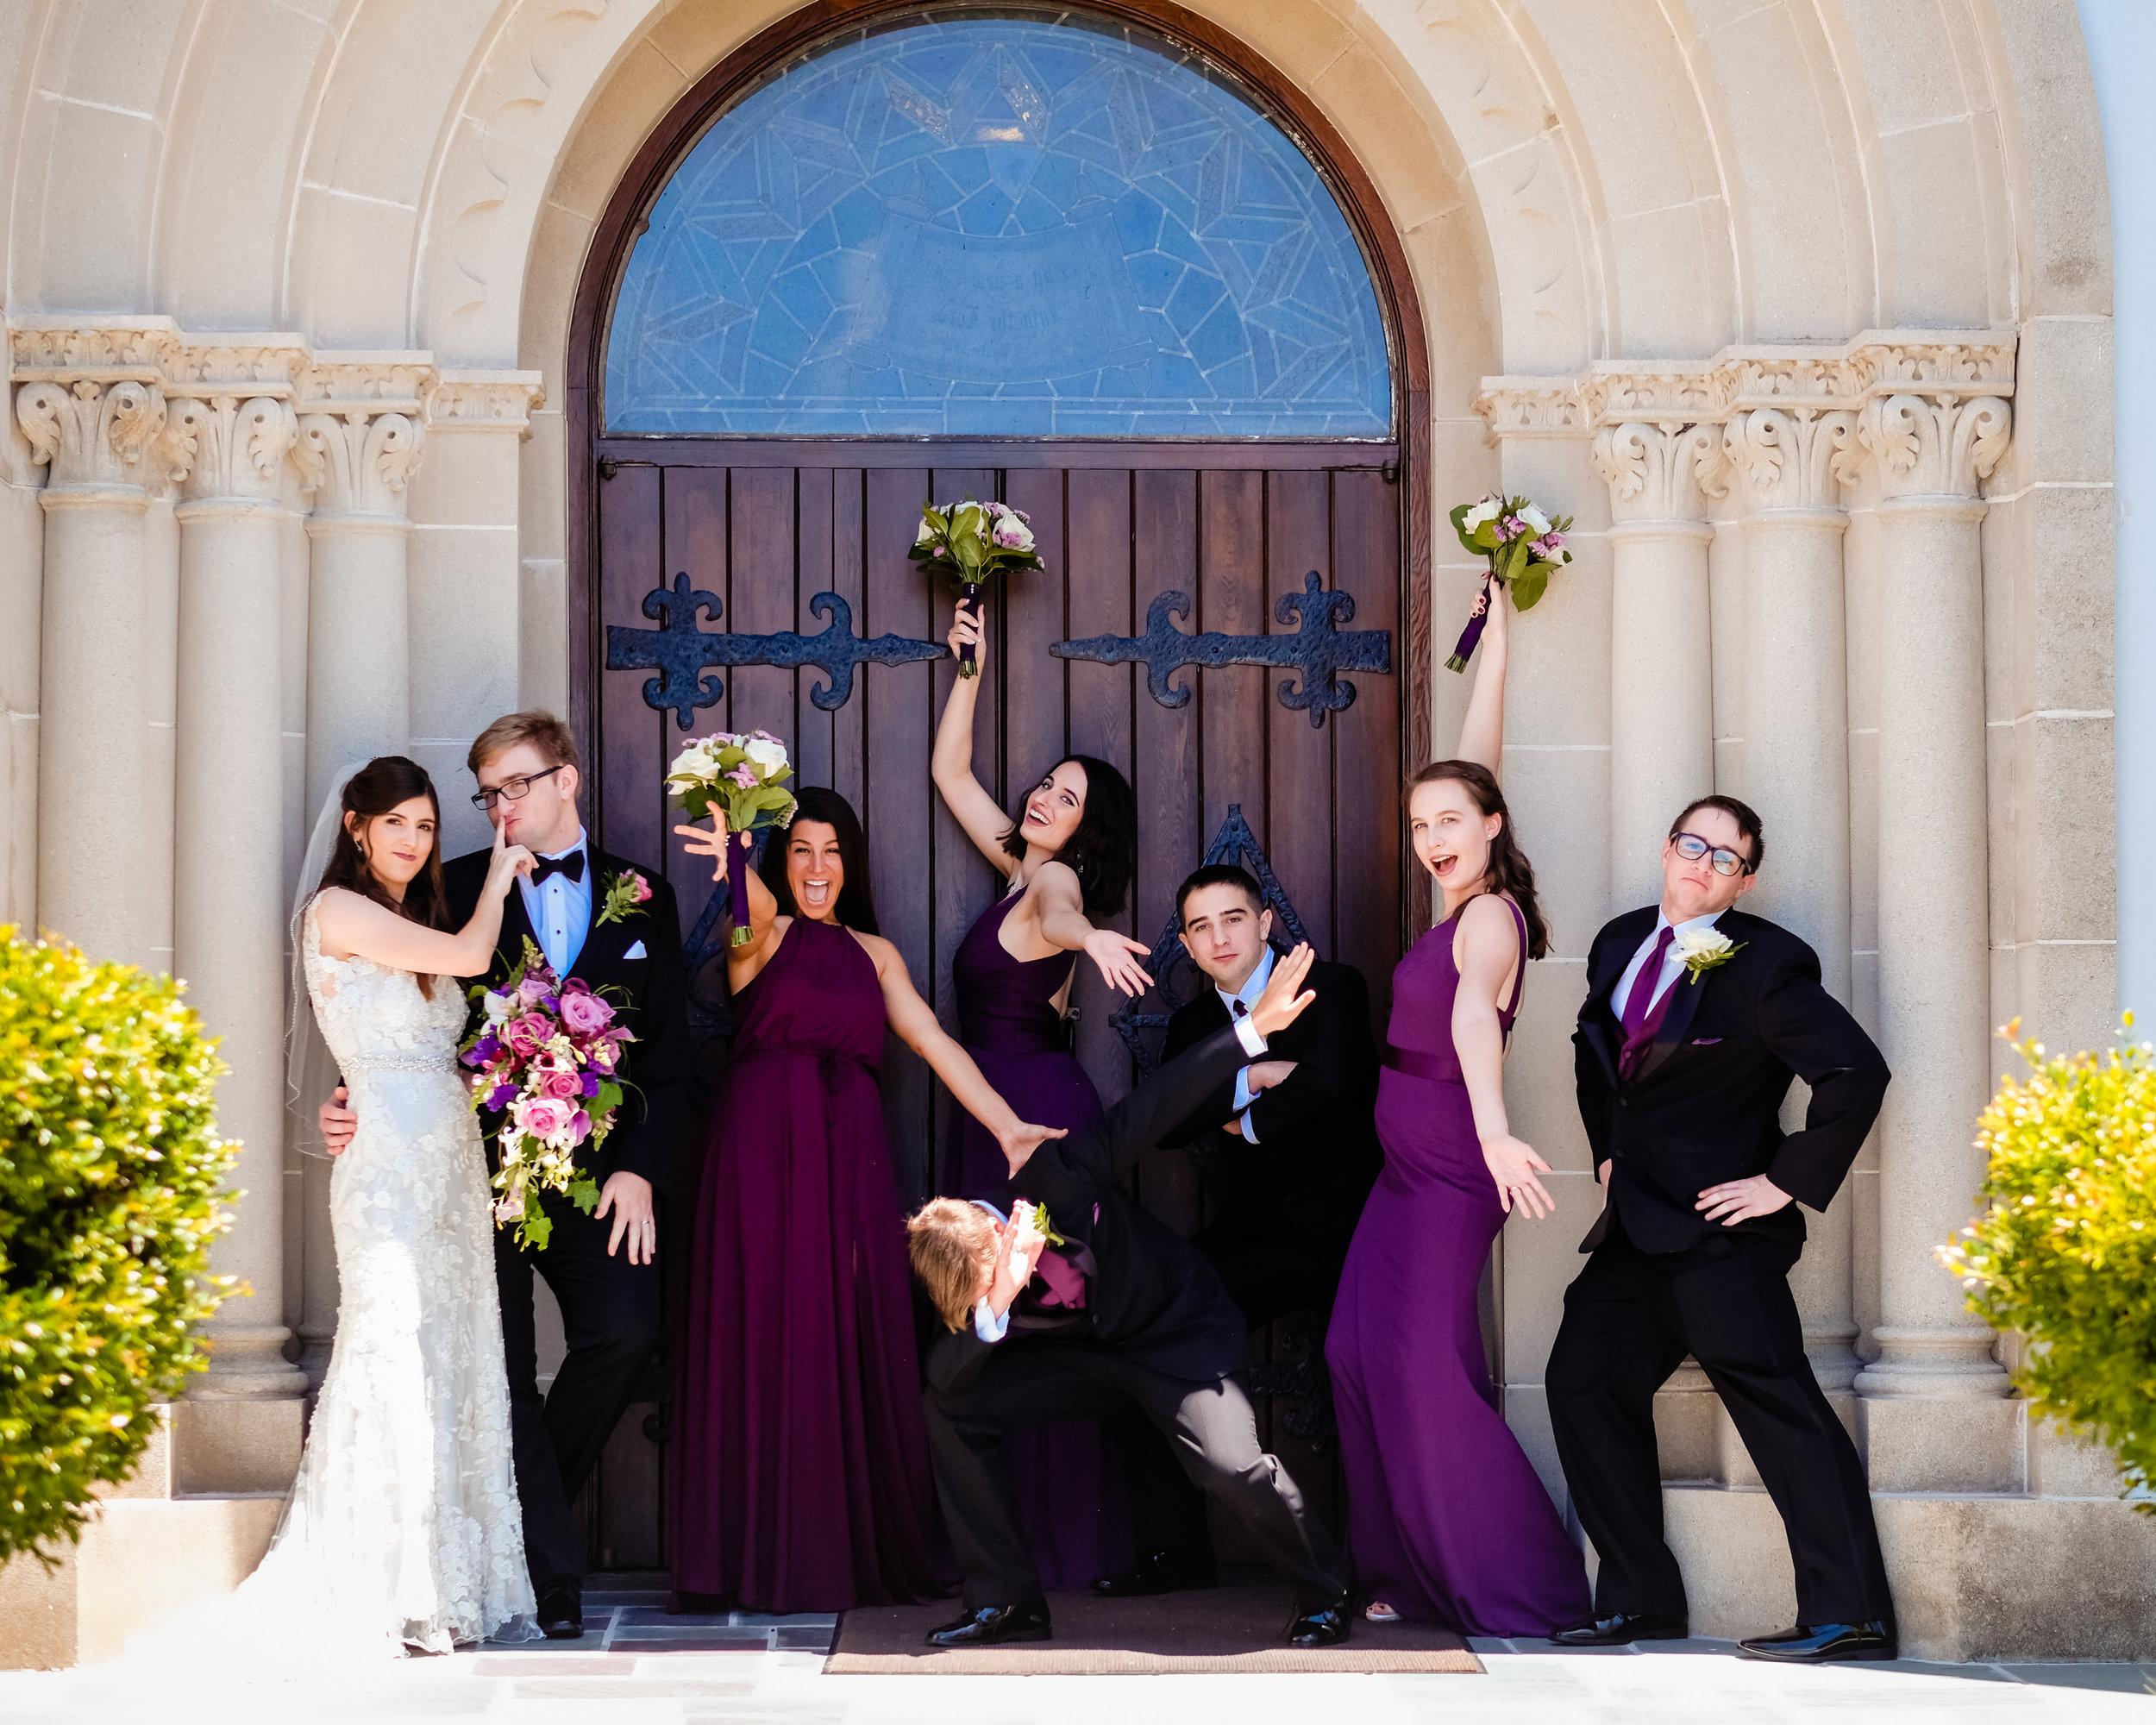 HAH_Zoe and Daniel_Clearwater Wedding_318_2018.jpg